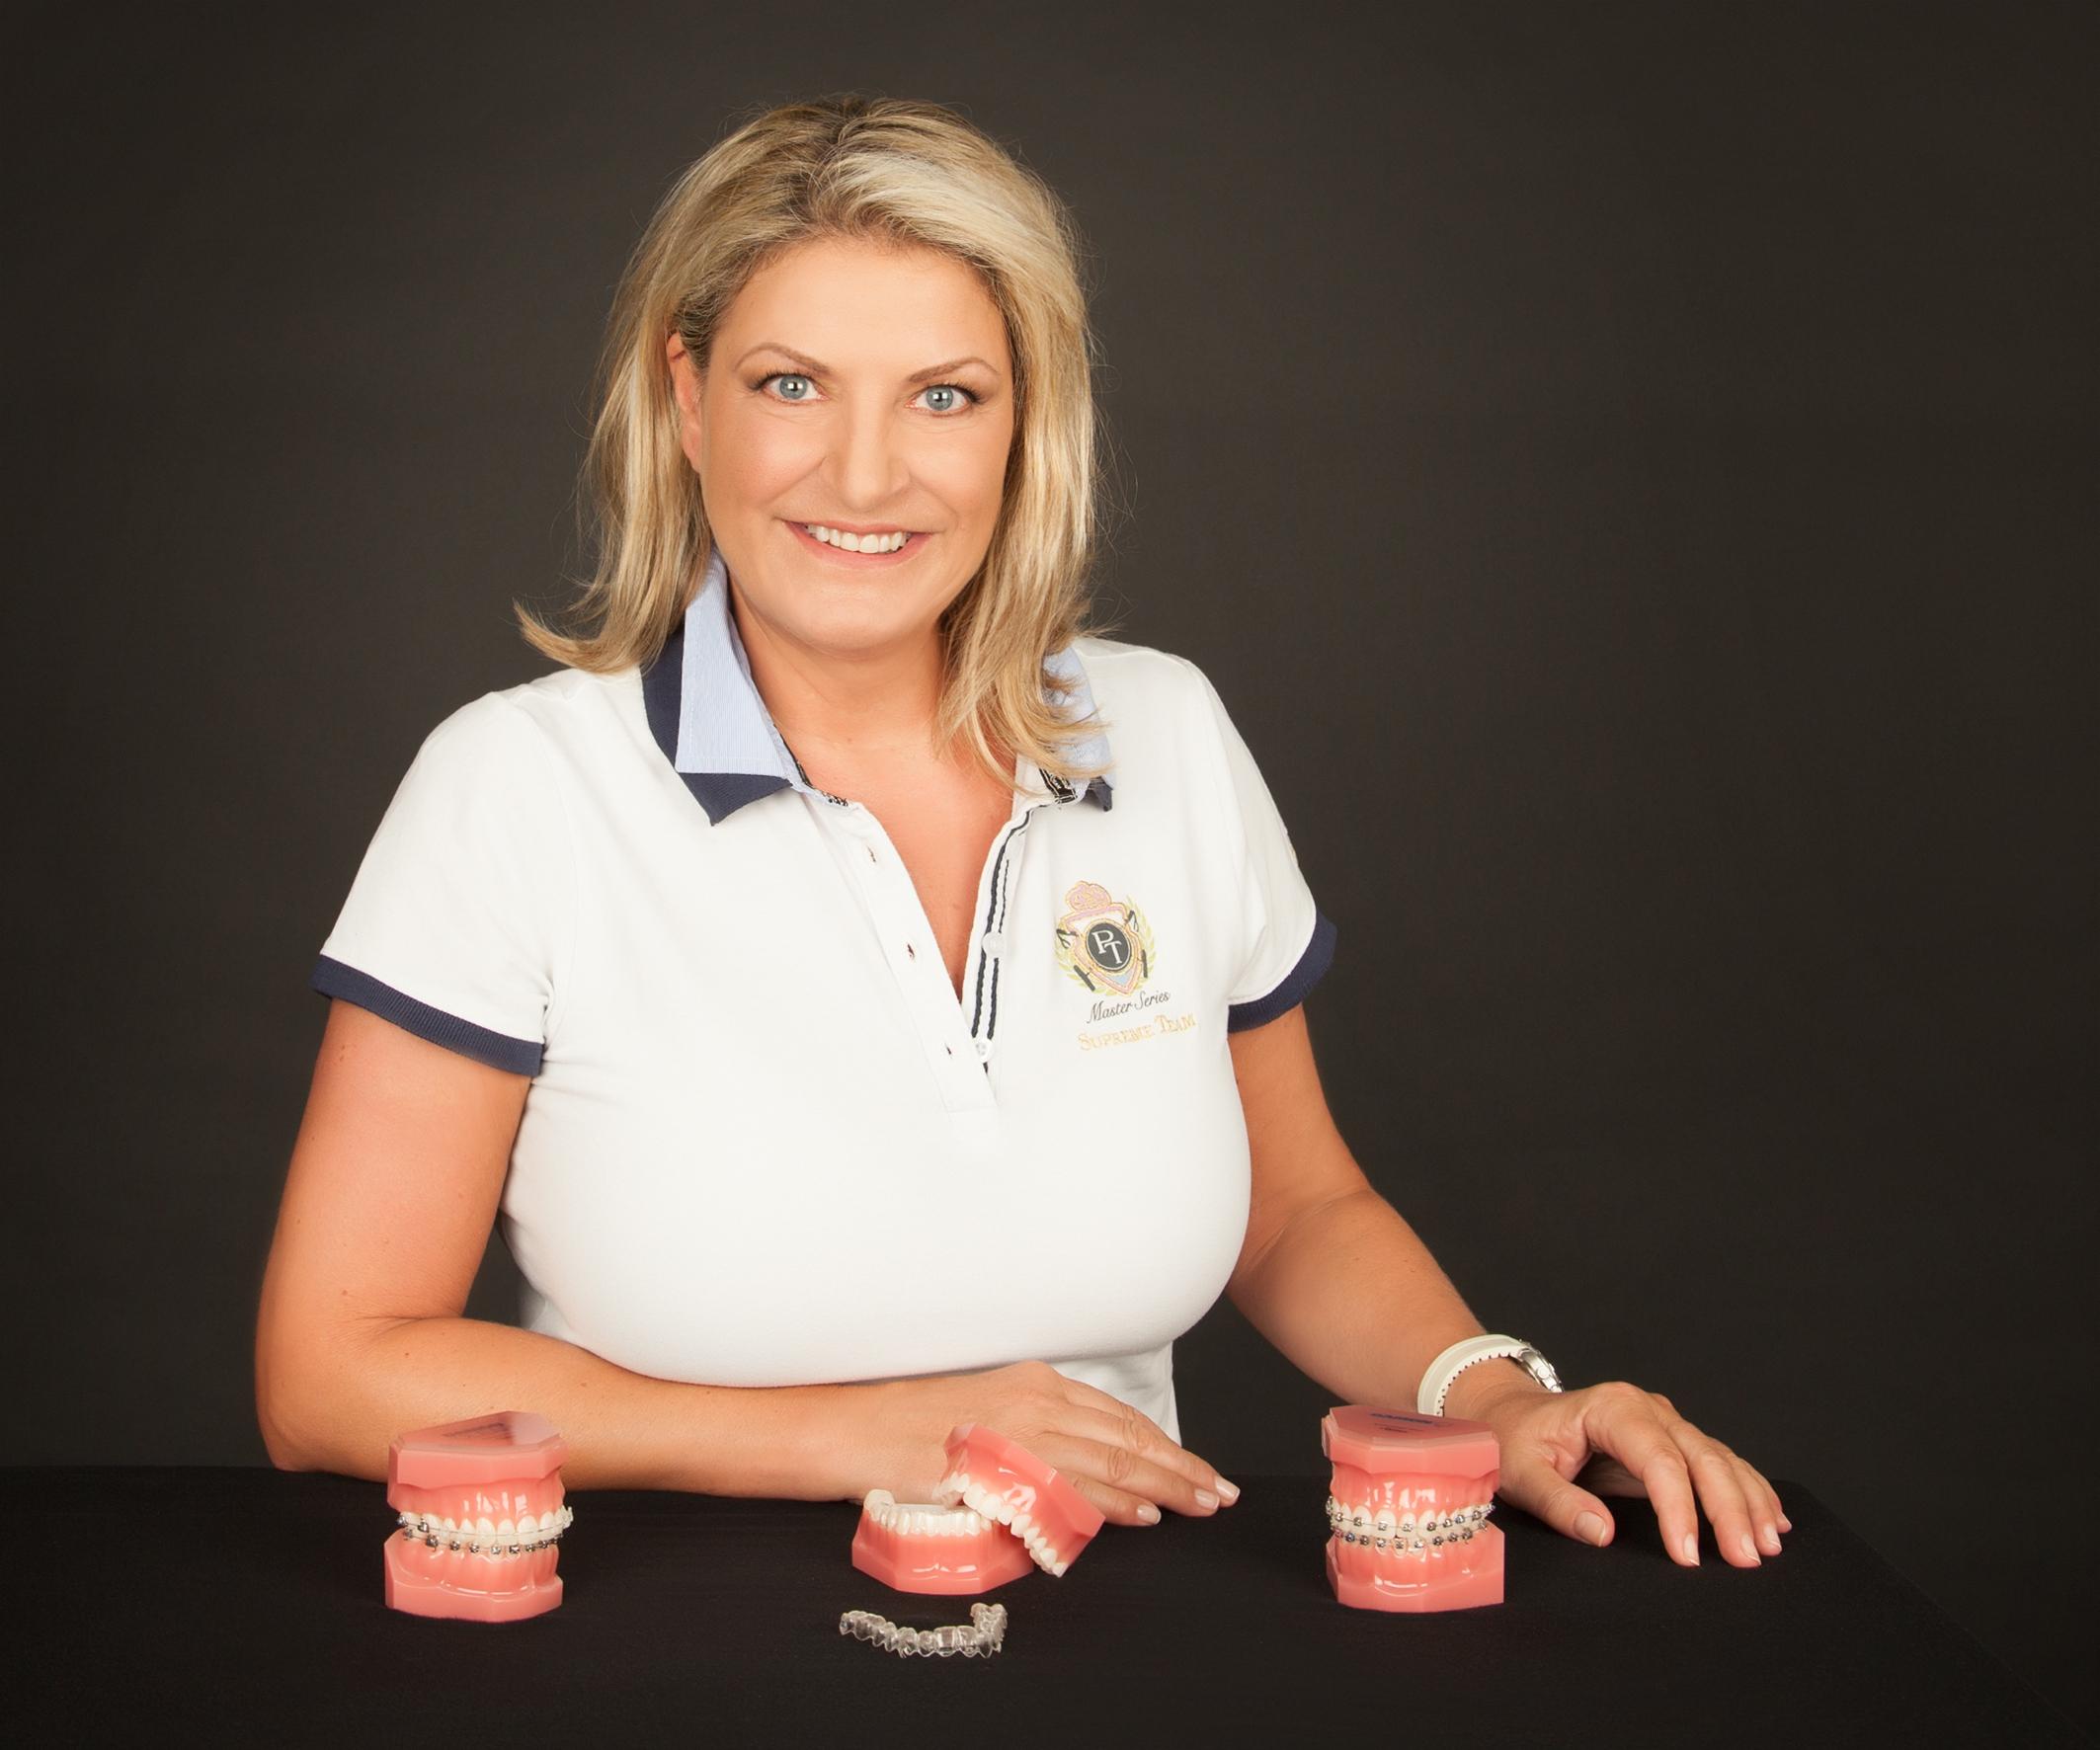 Zahnärztin Dr. Doris Leukauf Profil Bild